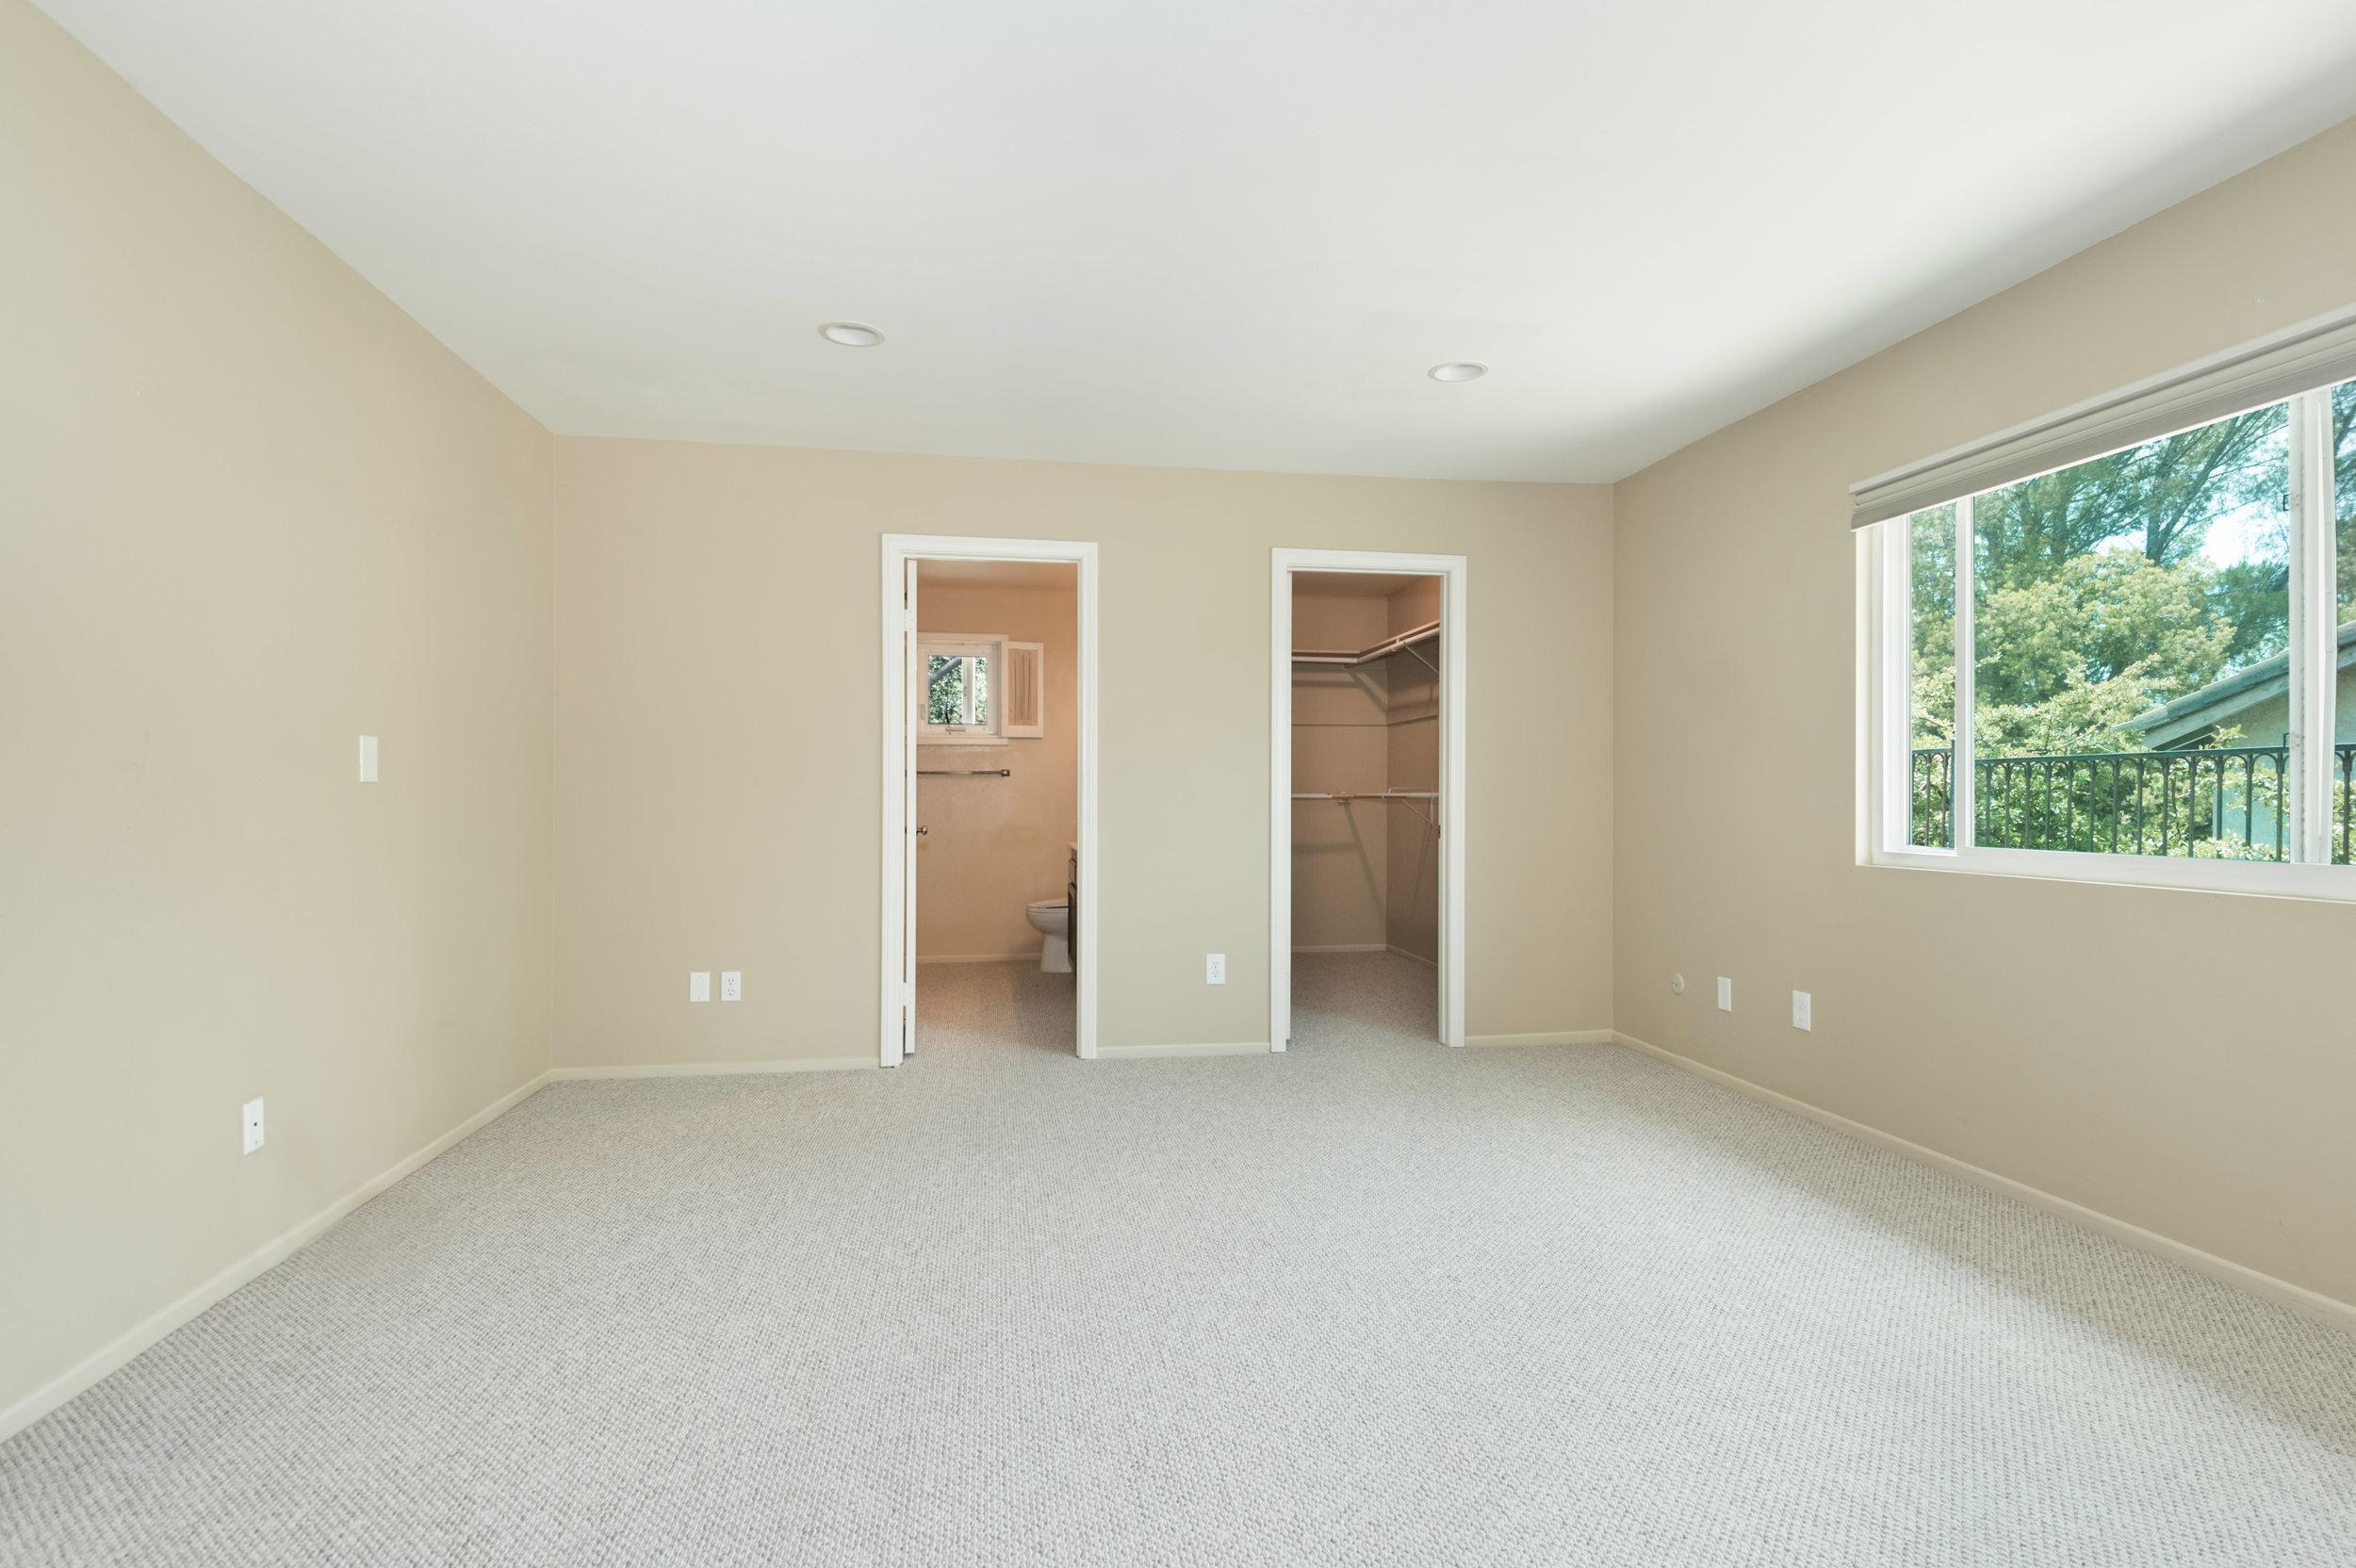 016 bedroom 8832 Moorcroft Avenue West Hills For Sale Lease The Malibu Life Team Luxury Real Estate.jpg